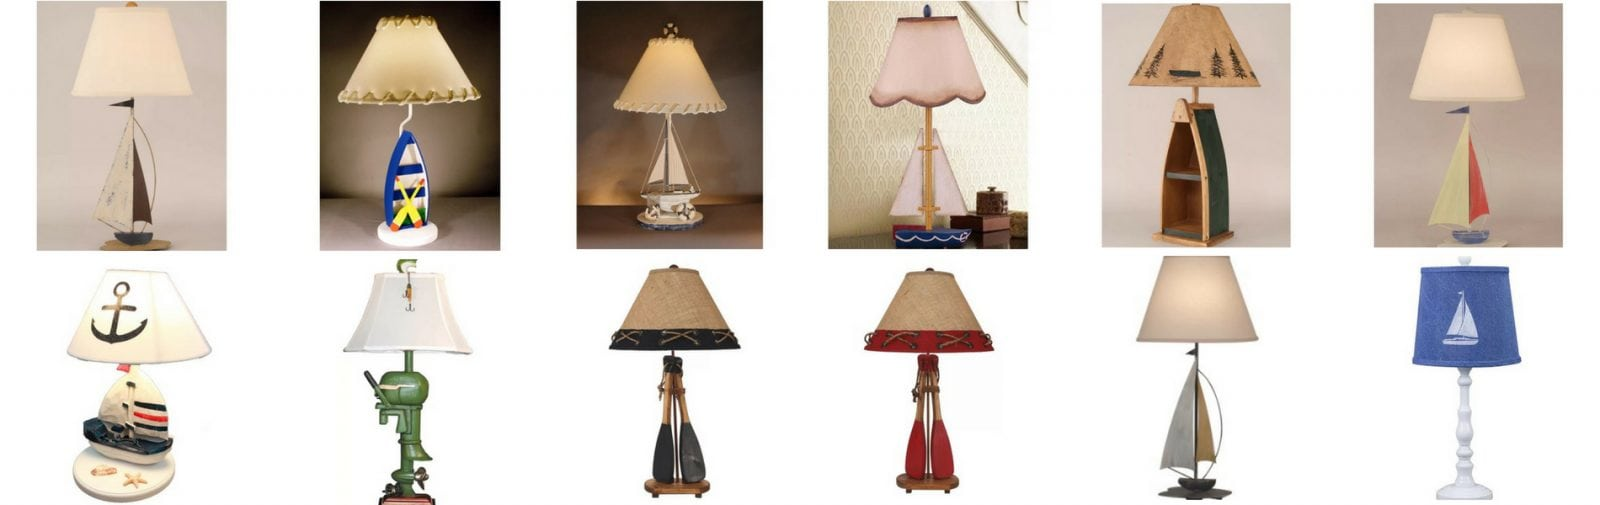 boat lamps and sailboat lamps